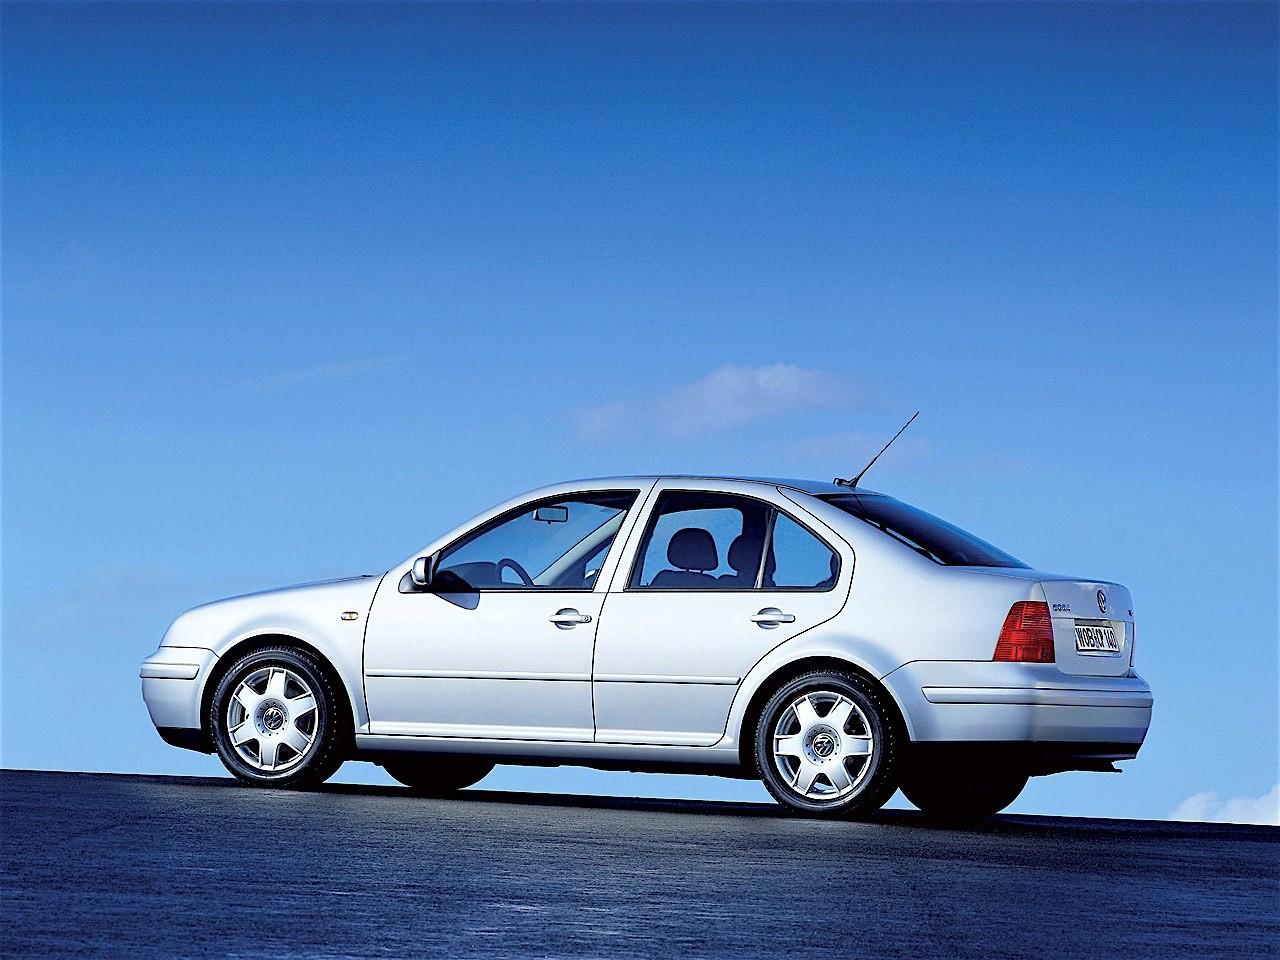 VW Bora 1.4 1.6 1.8 1.9 2.0 TDI FSI 98-05//05 Lower Arm Bush front Off Side Delph